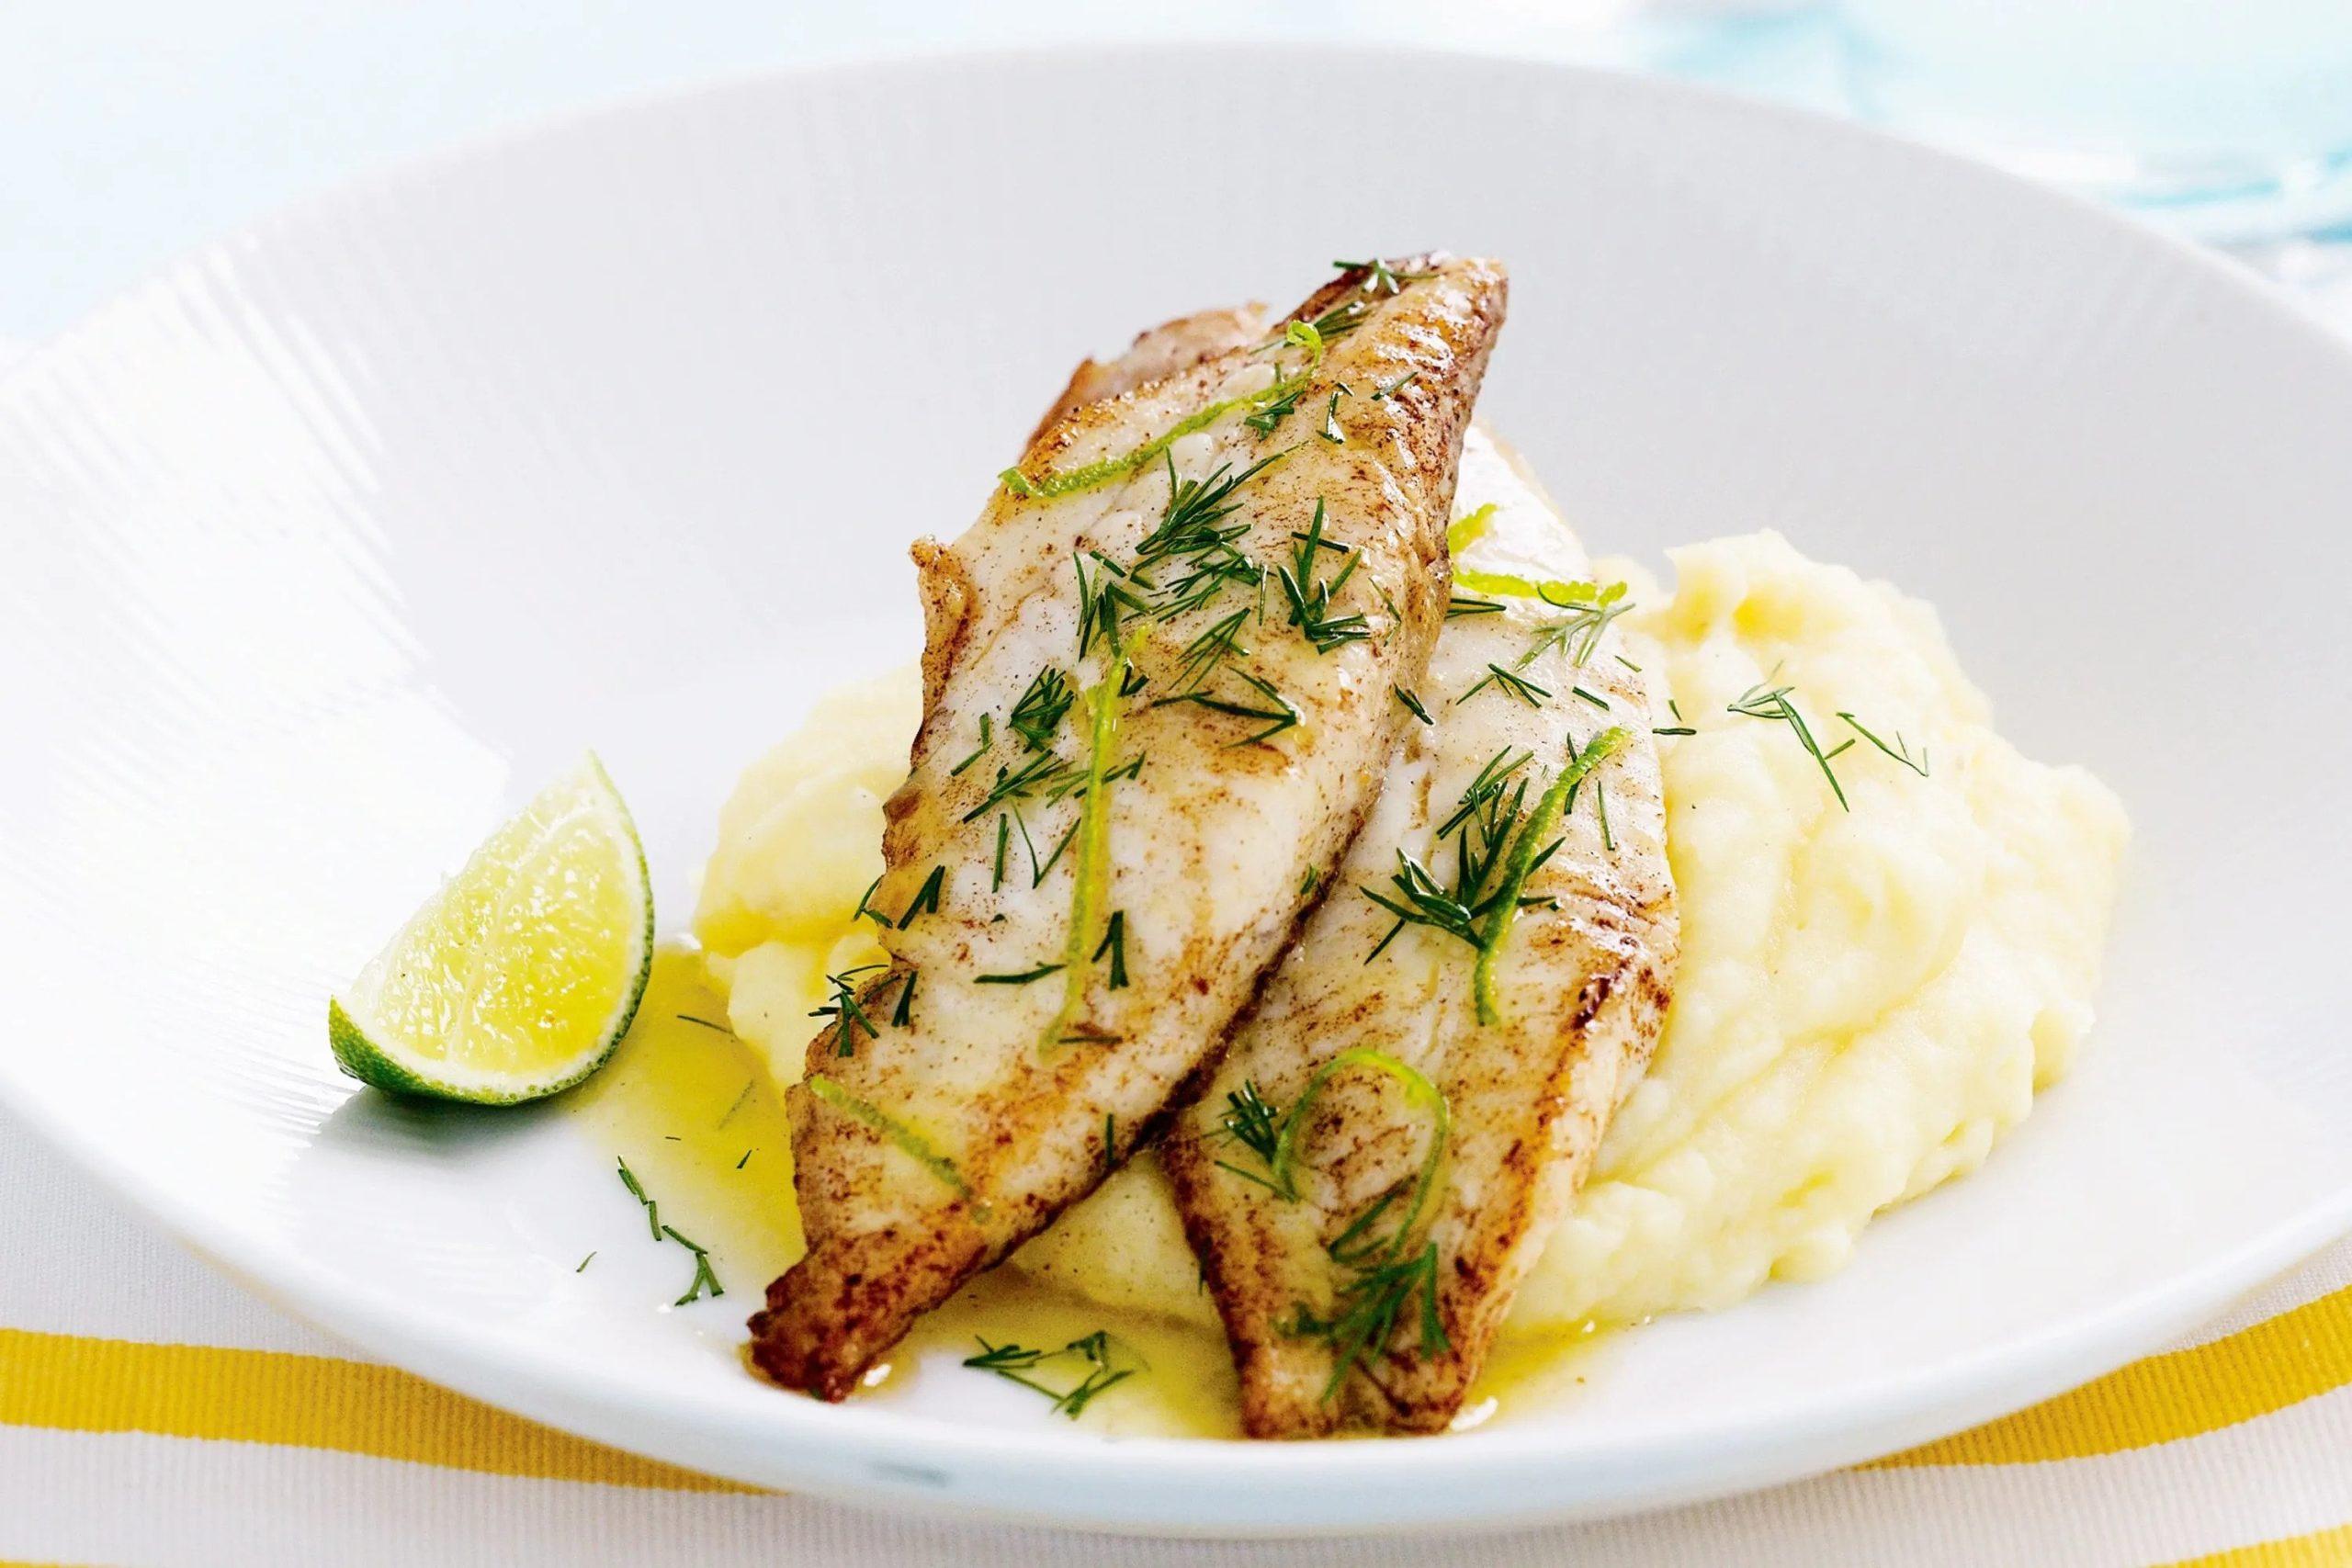 Pan-Fried Fish with Lemon Mashed Potato